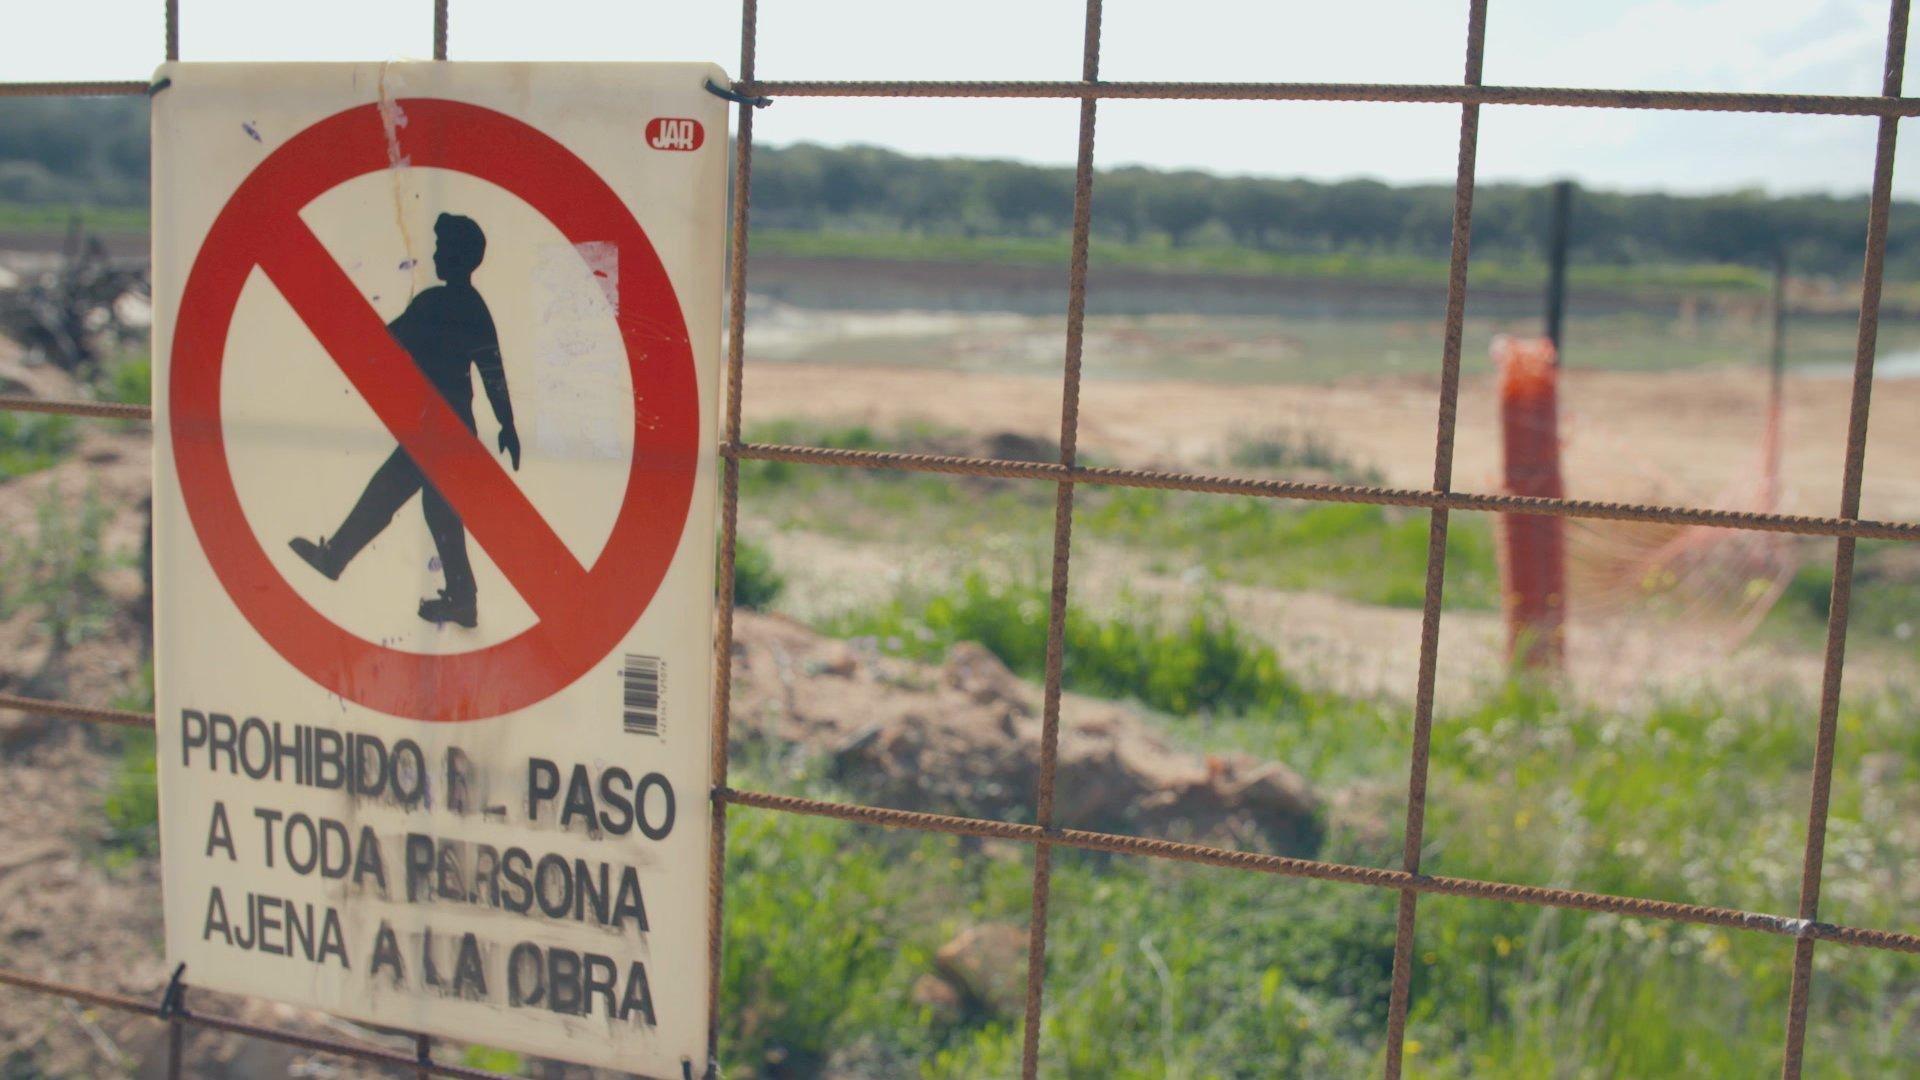 Uran-Mine vor der Haustür – Streit um Spaniens Salamanca-Projekt (Doku)